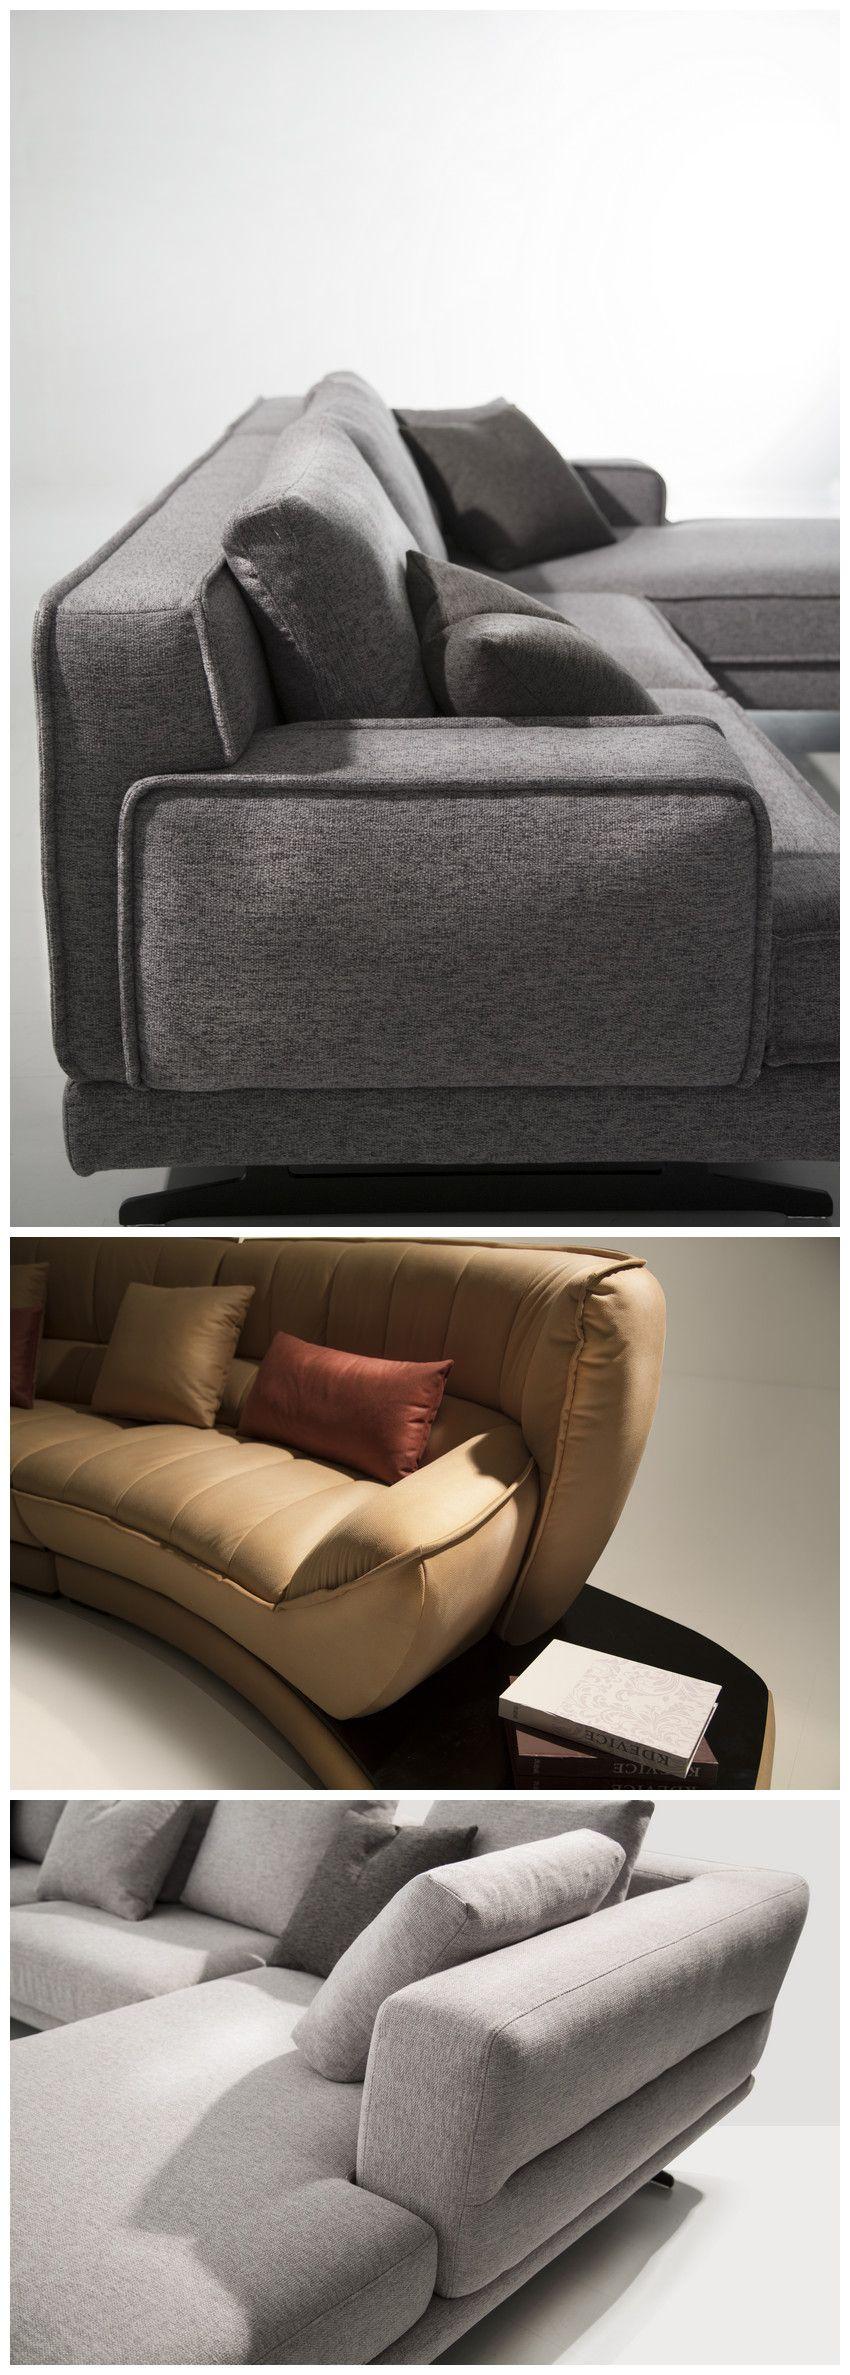 New Design Modern Sofa Set Sofaset Sofa Cocheen Modernsofa Cocheendesign Livingroomsofa Furniture Newdesign Modern Sofa Modern Sofa Set Grey Sofa Decor